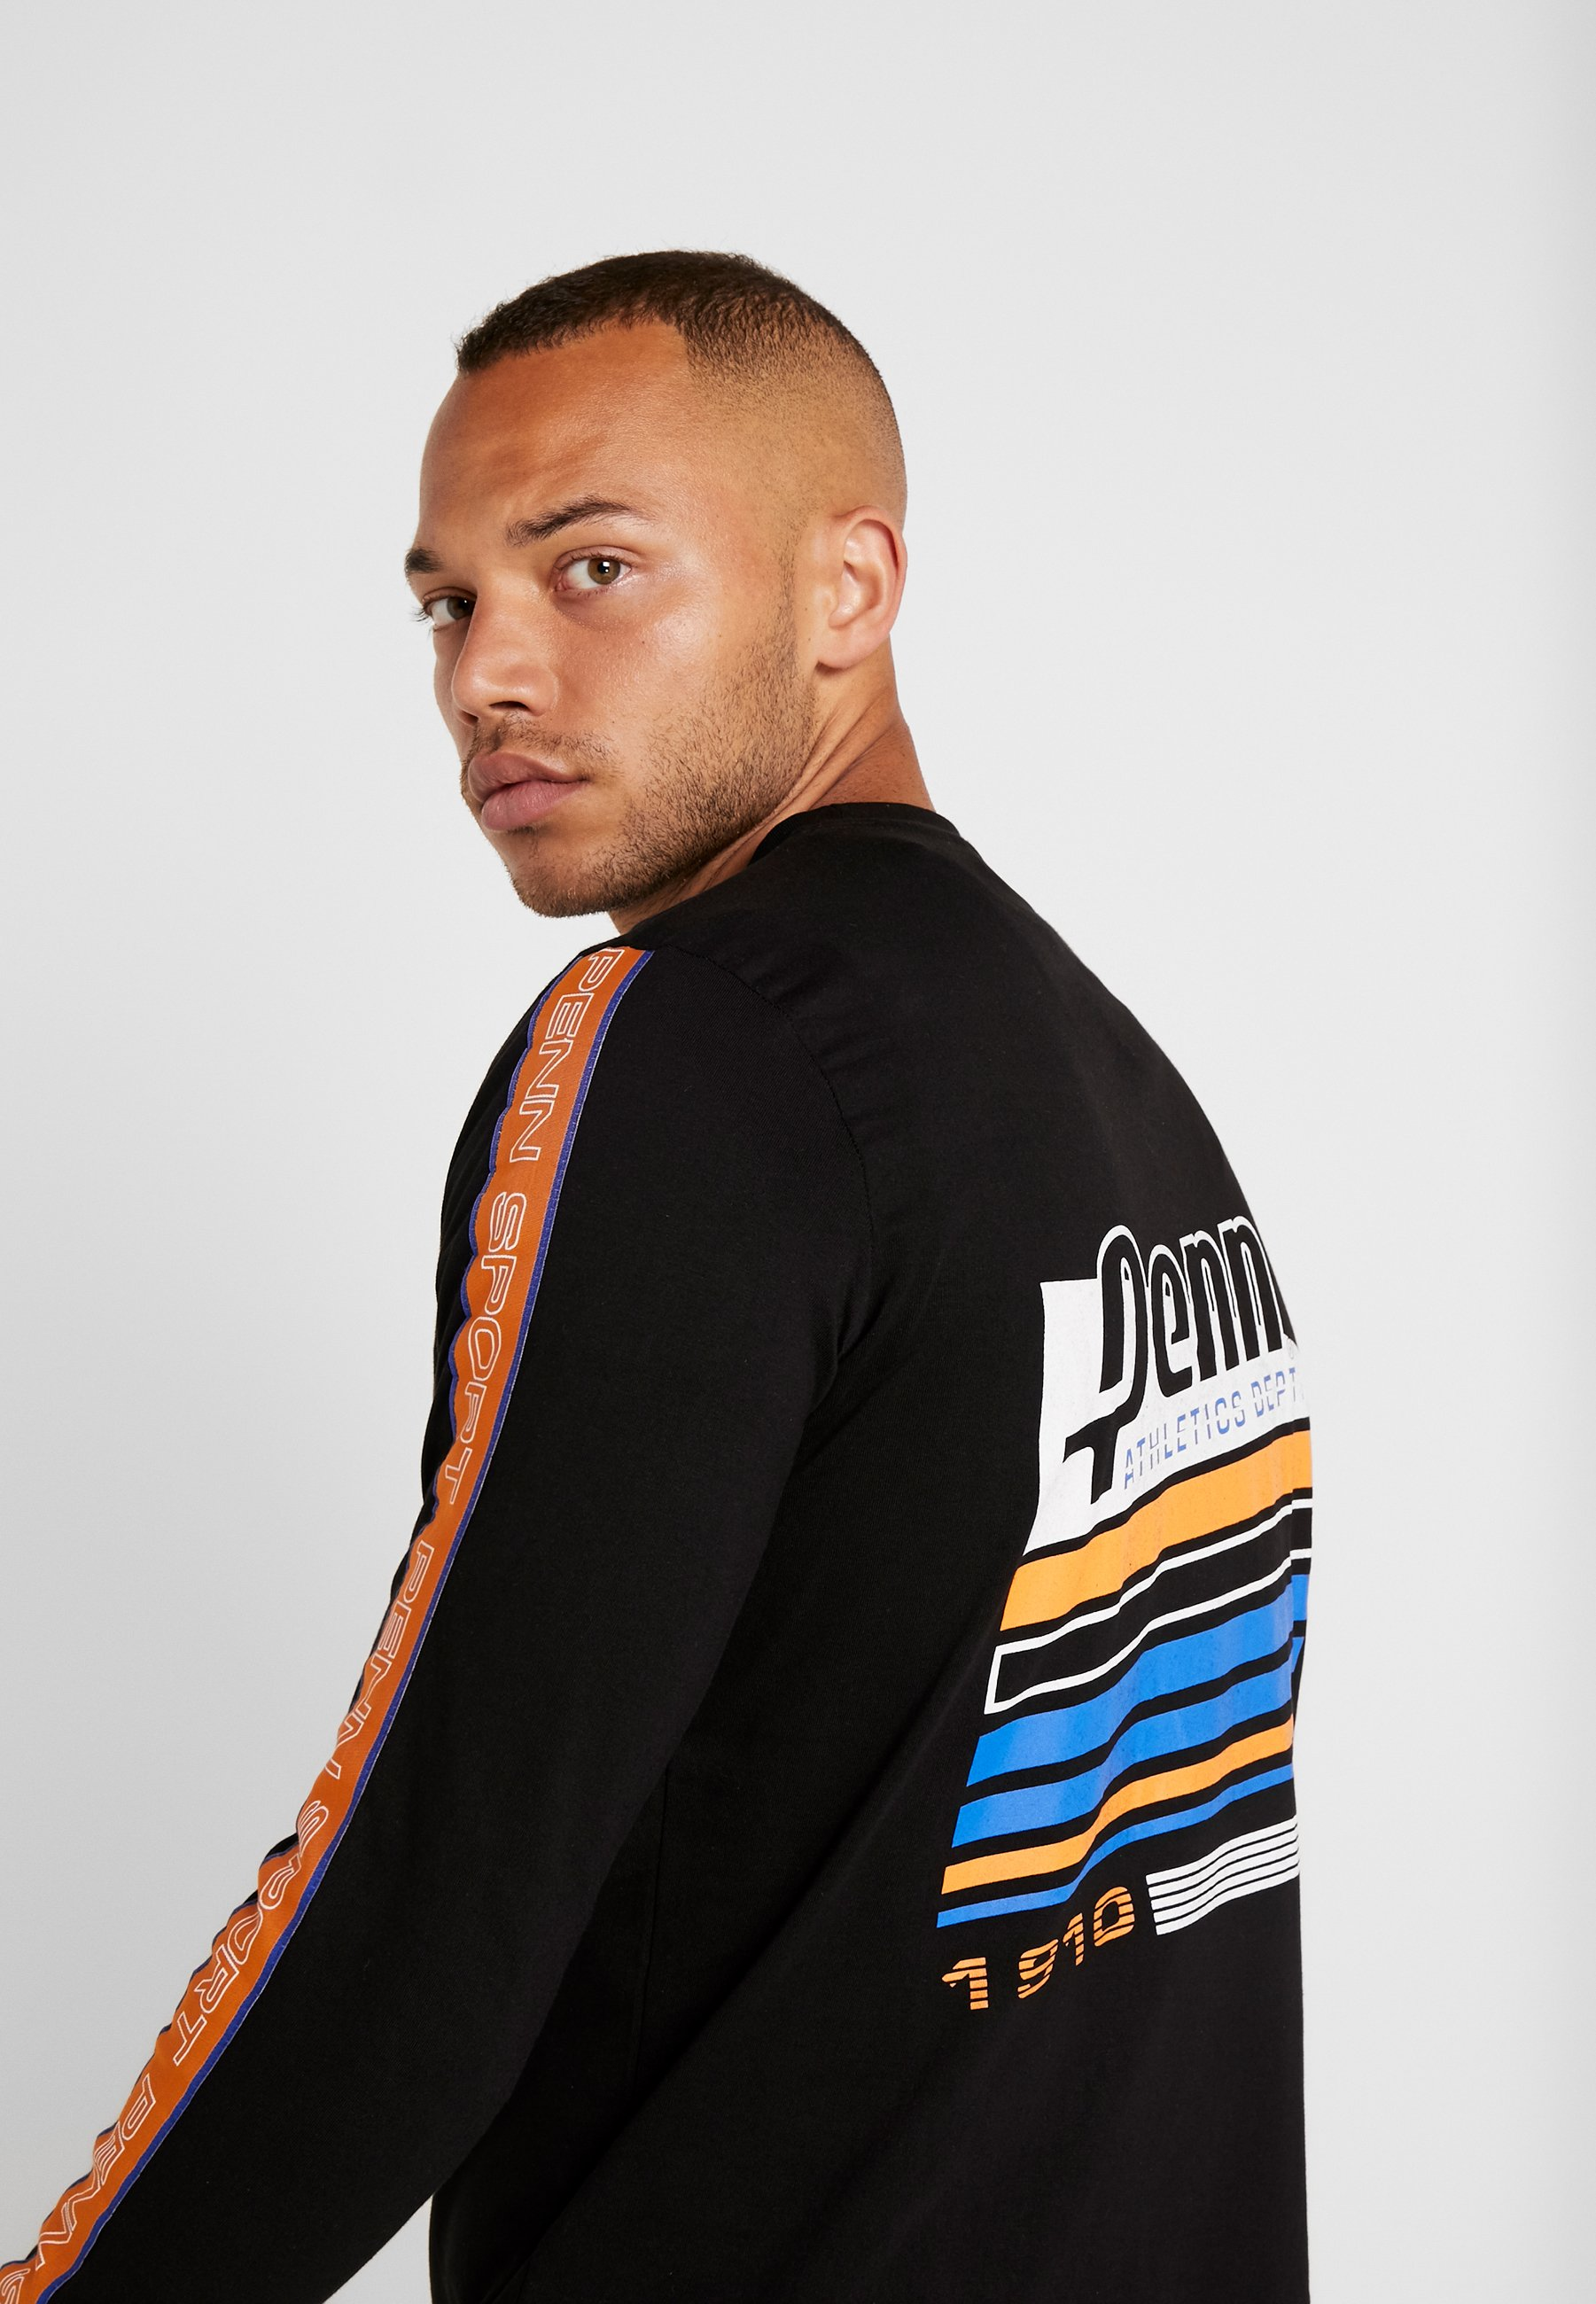 Black Long Manches À Taped shirt TeeT Graphica Sleeve Men's Penn Longues cLq354AjRS